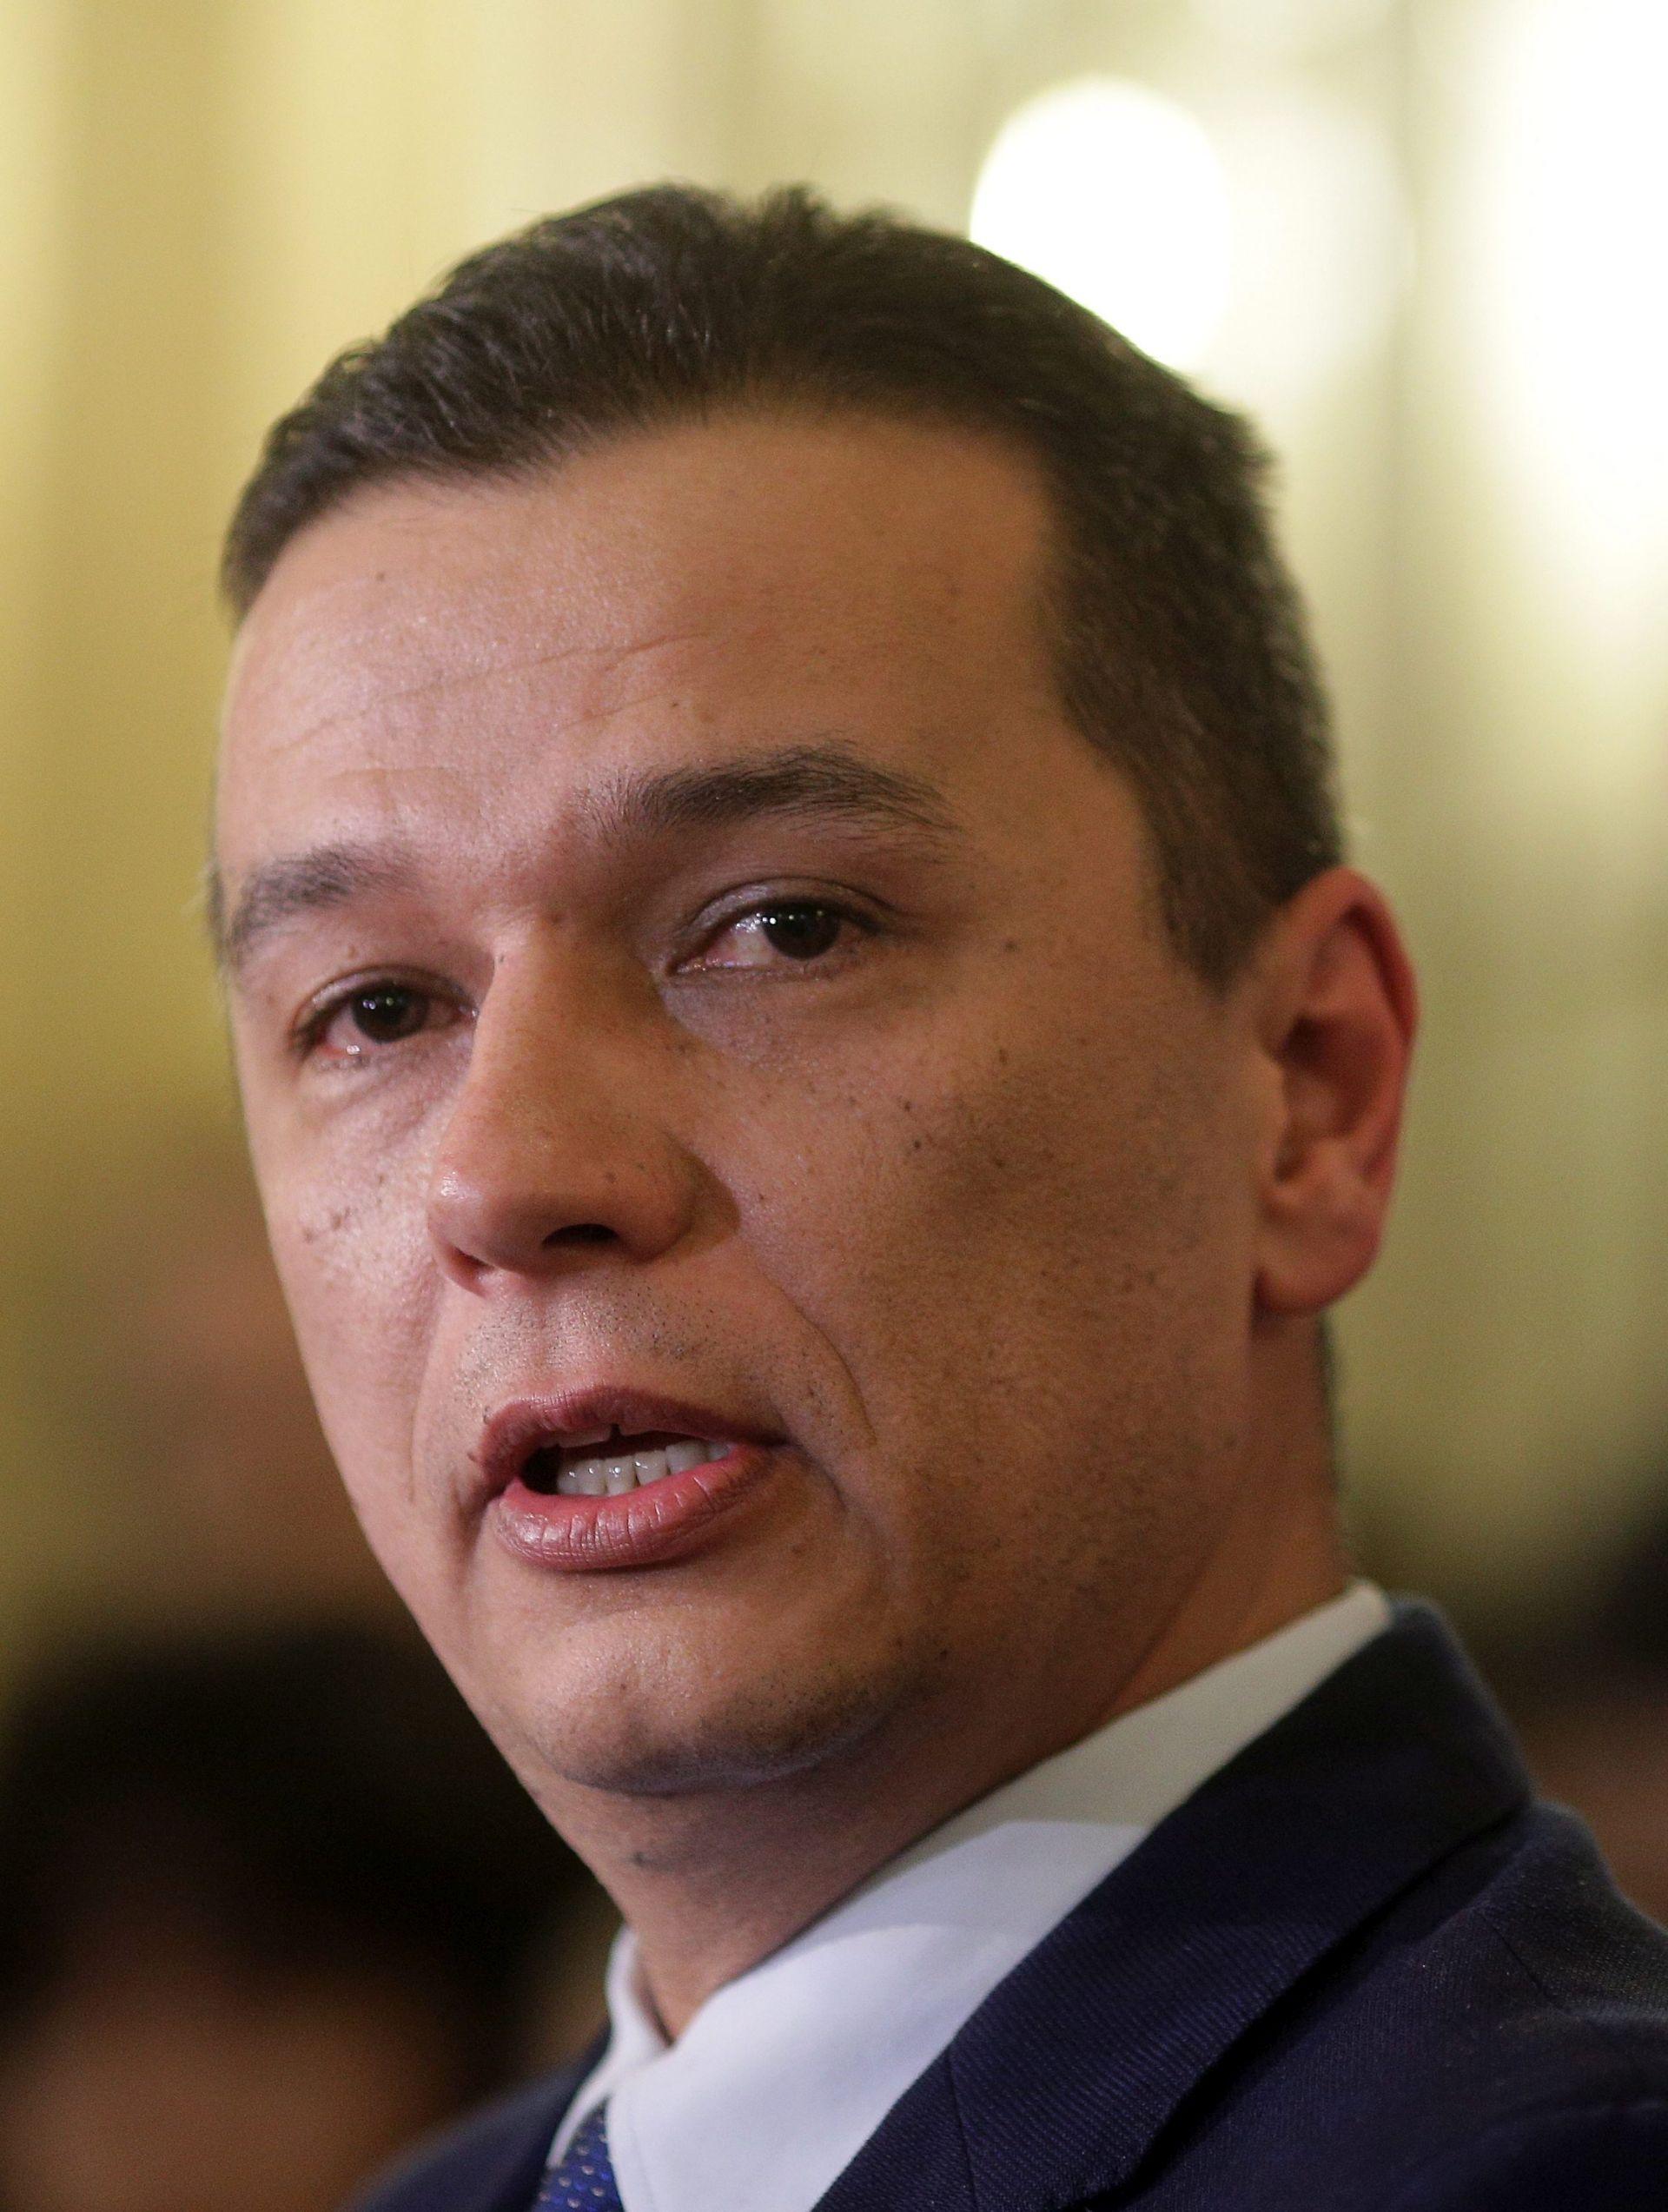 Sorin Grindeanu novi mandatar rumunjske vlade